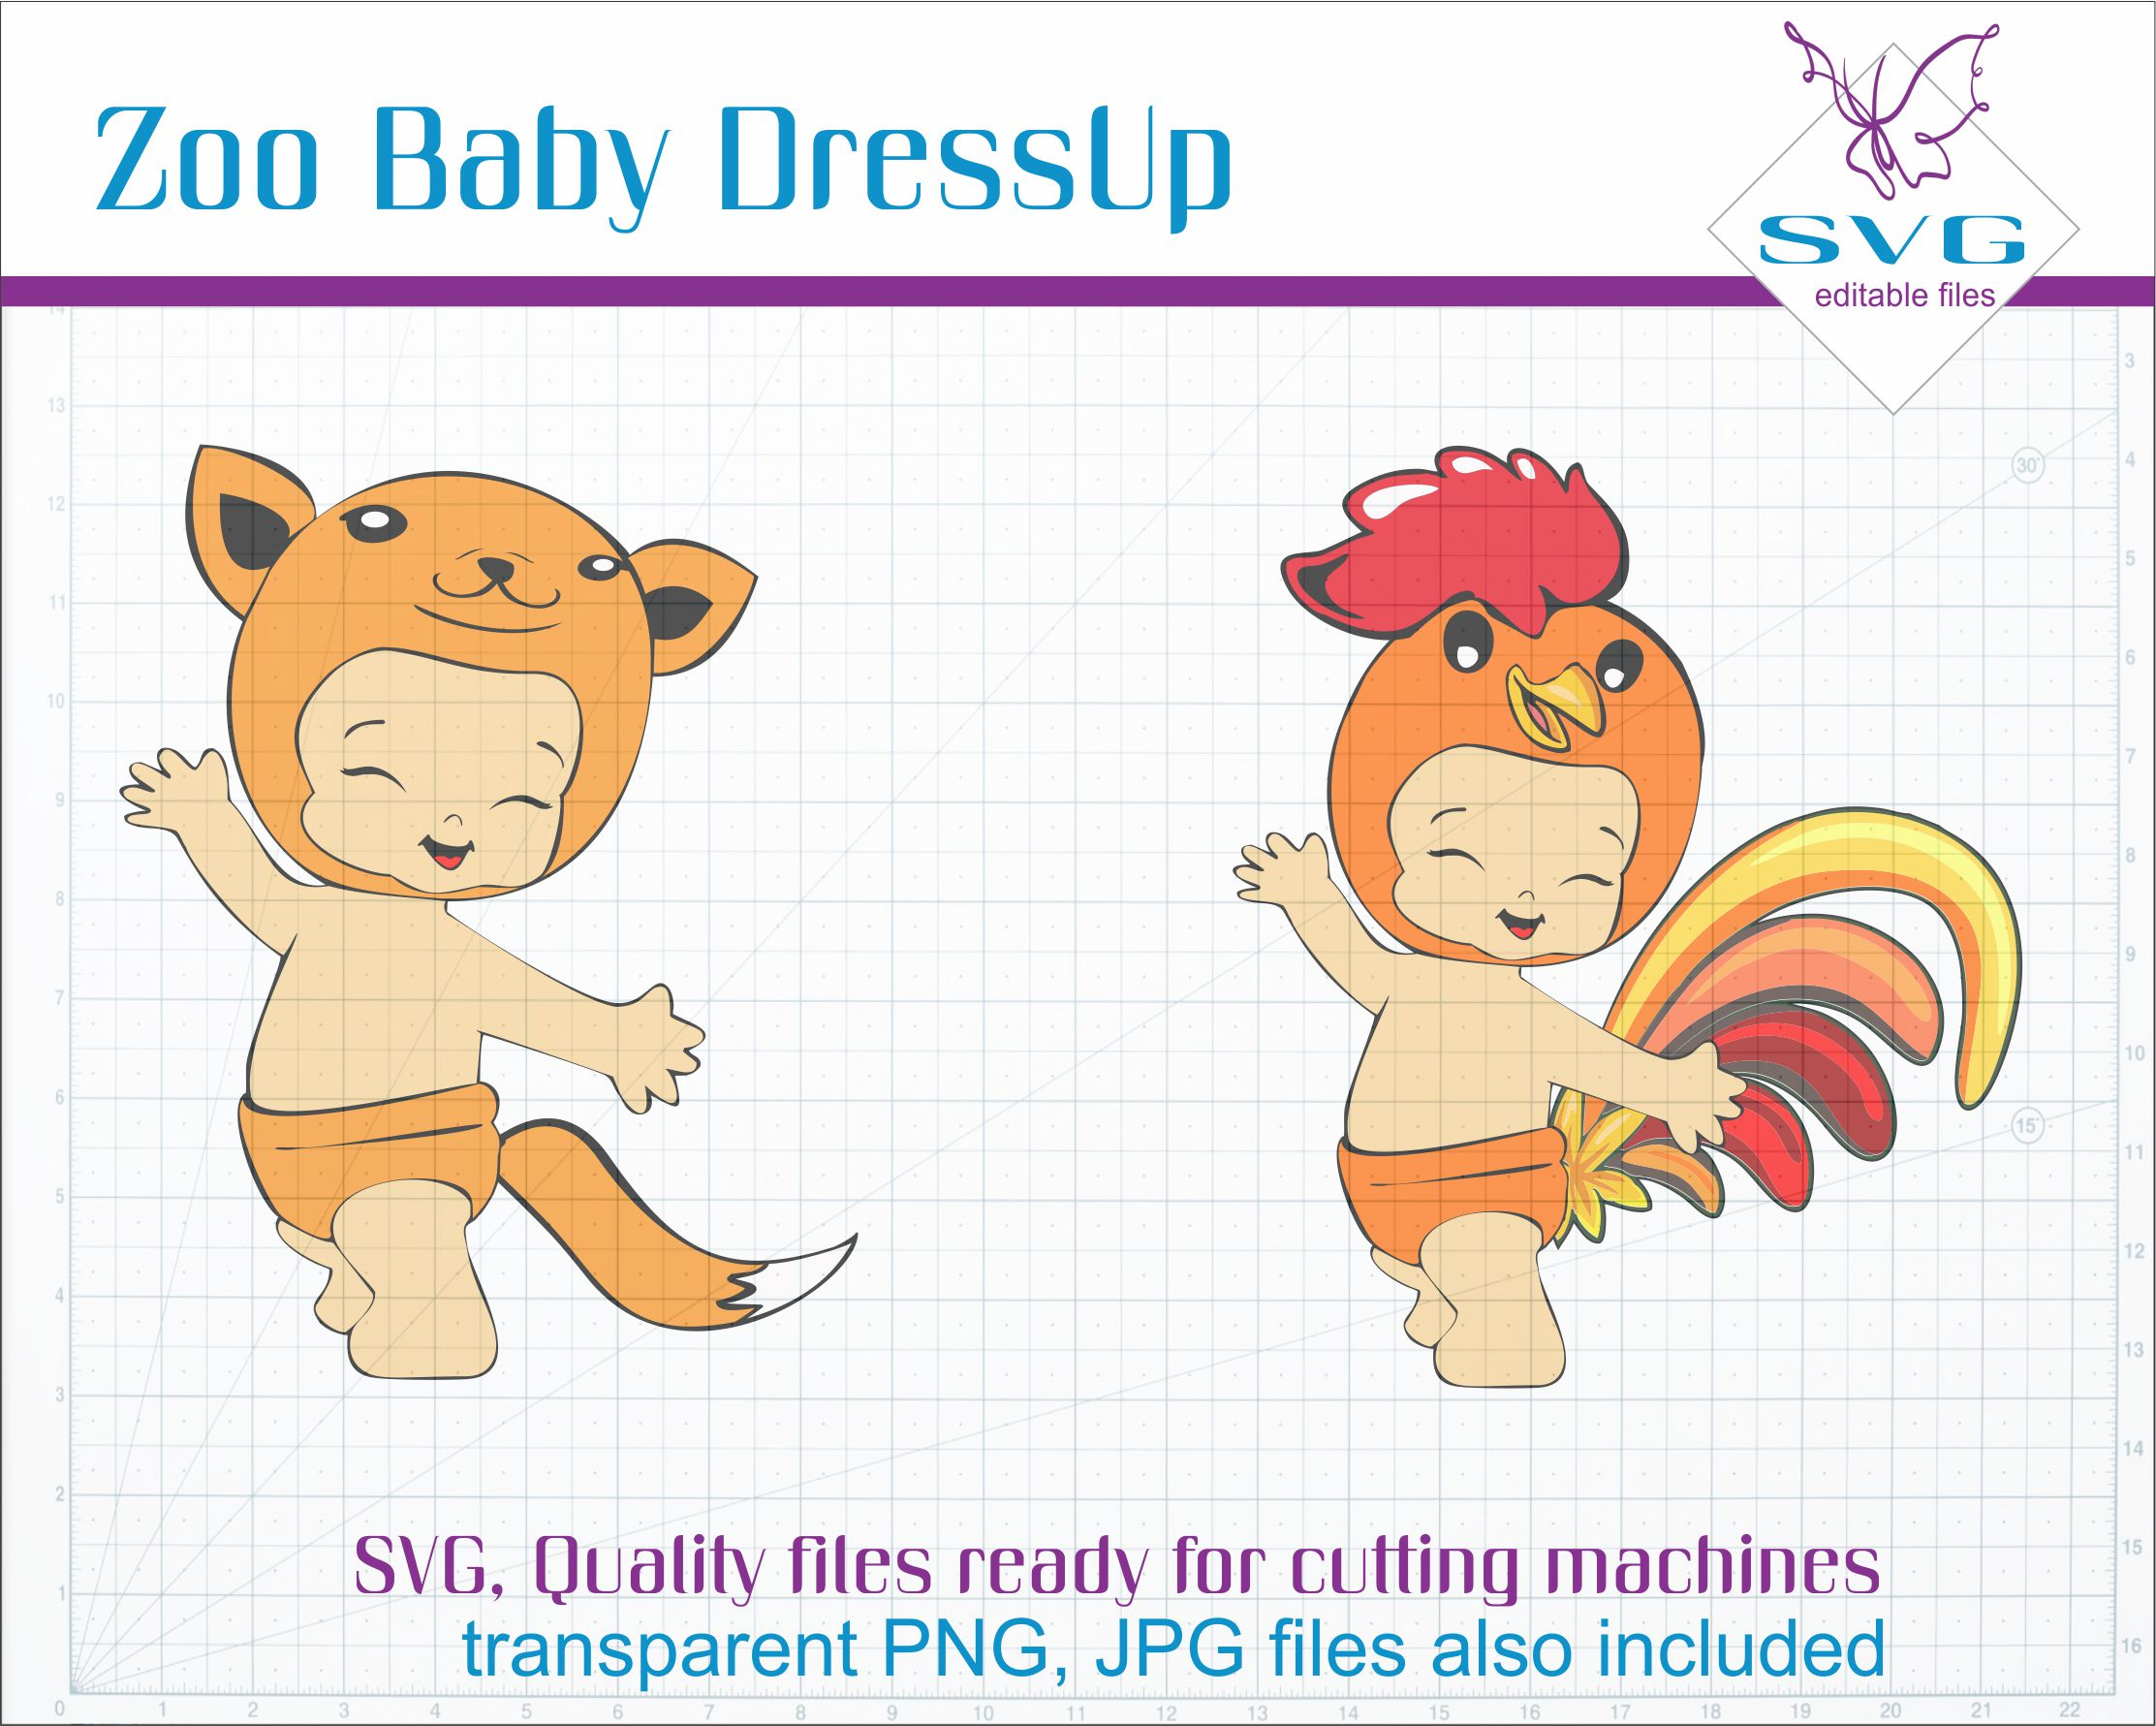 Zoo Baby Dressup example image 4